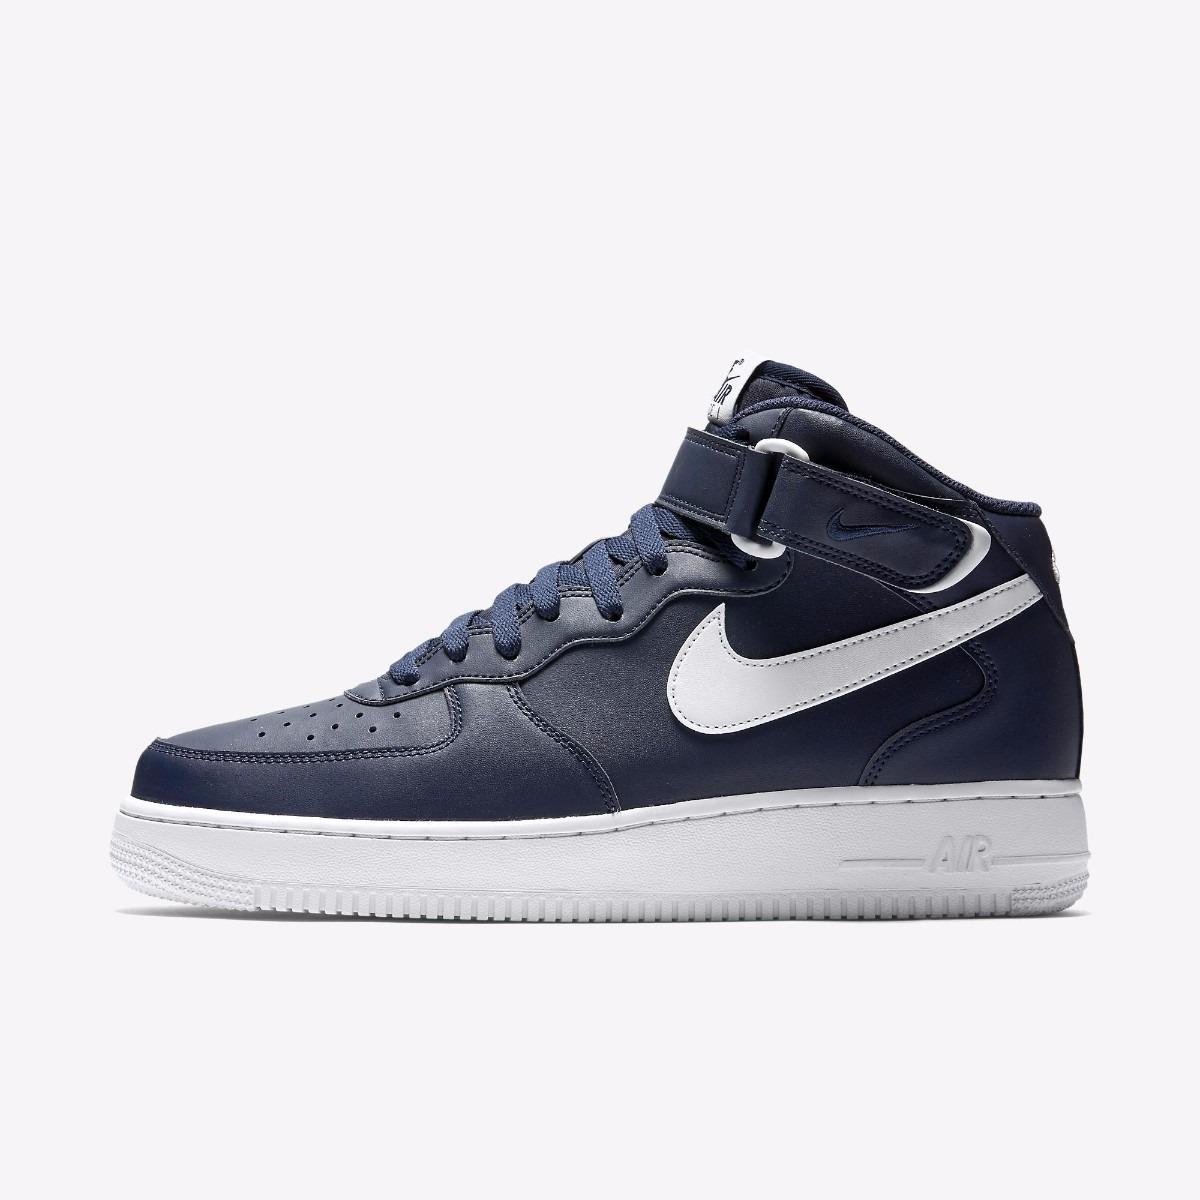 Tênis Nike Air Force 1 Mid '07 Original Ref. 315123 407